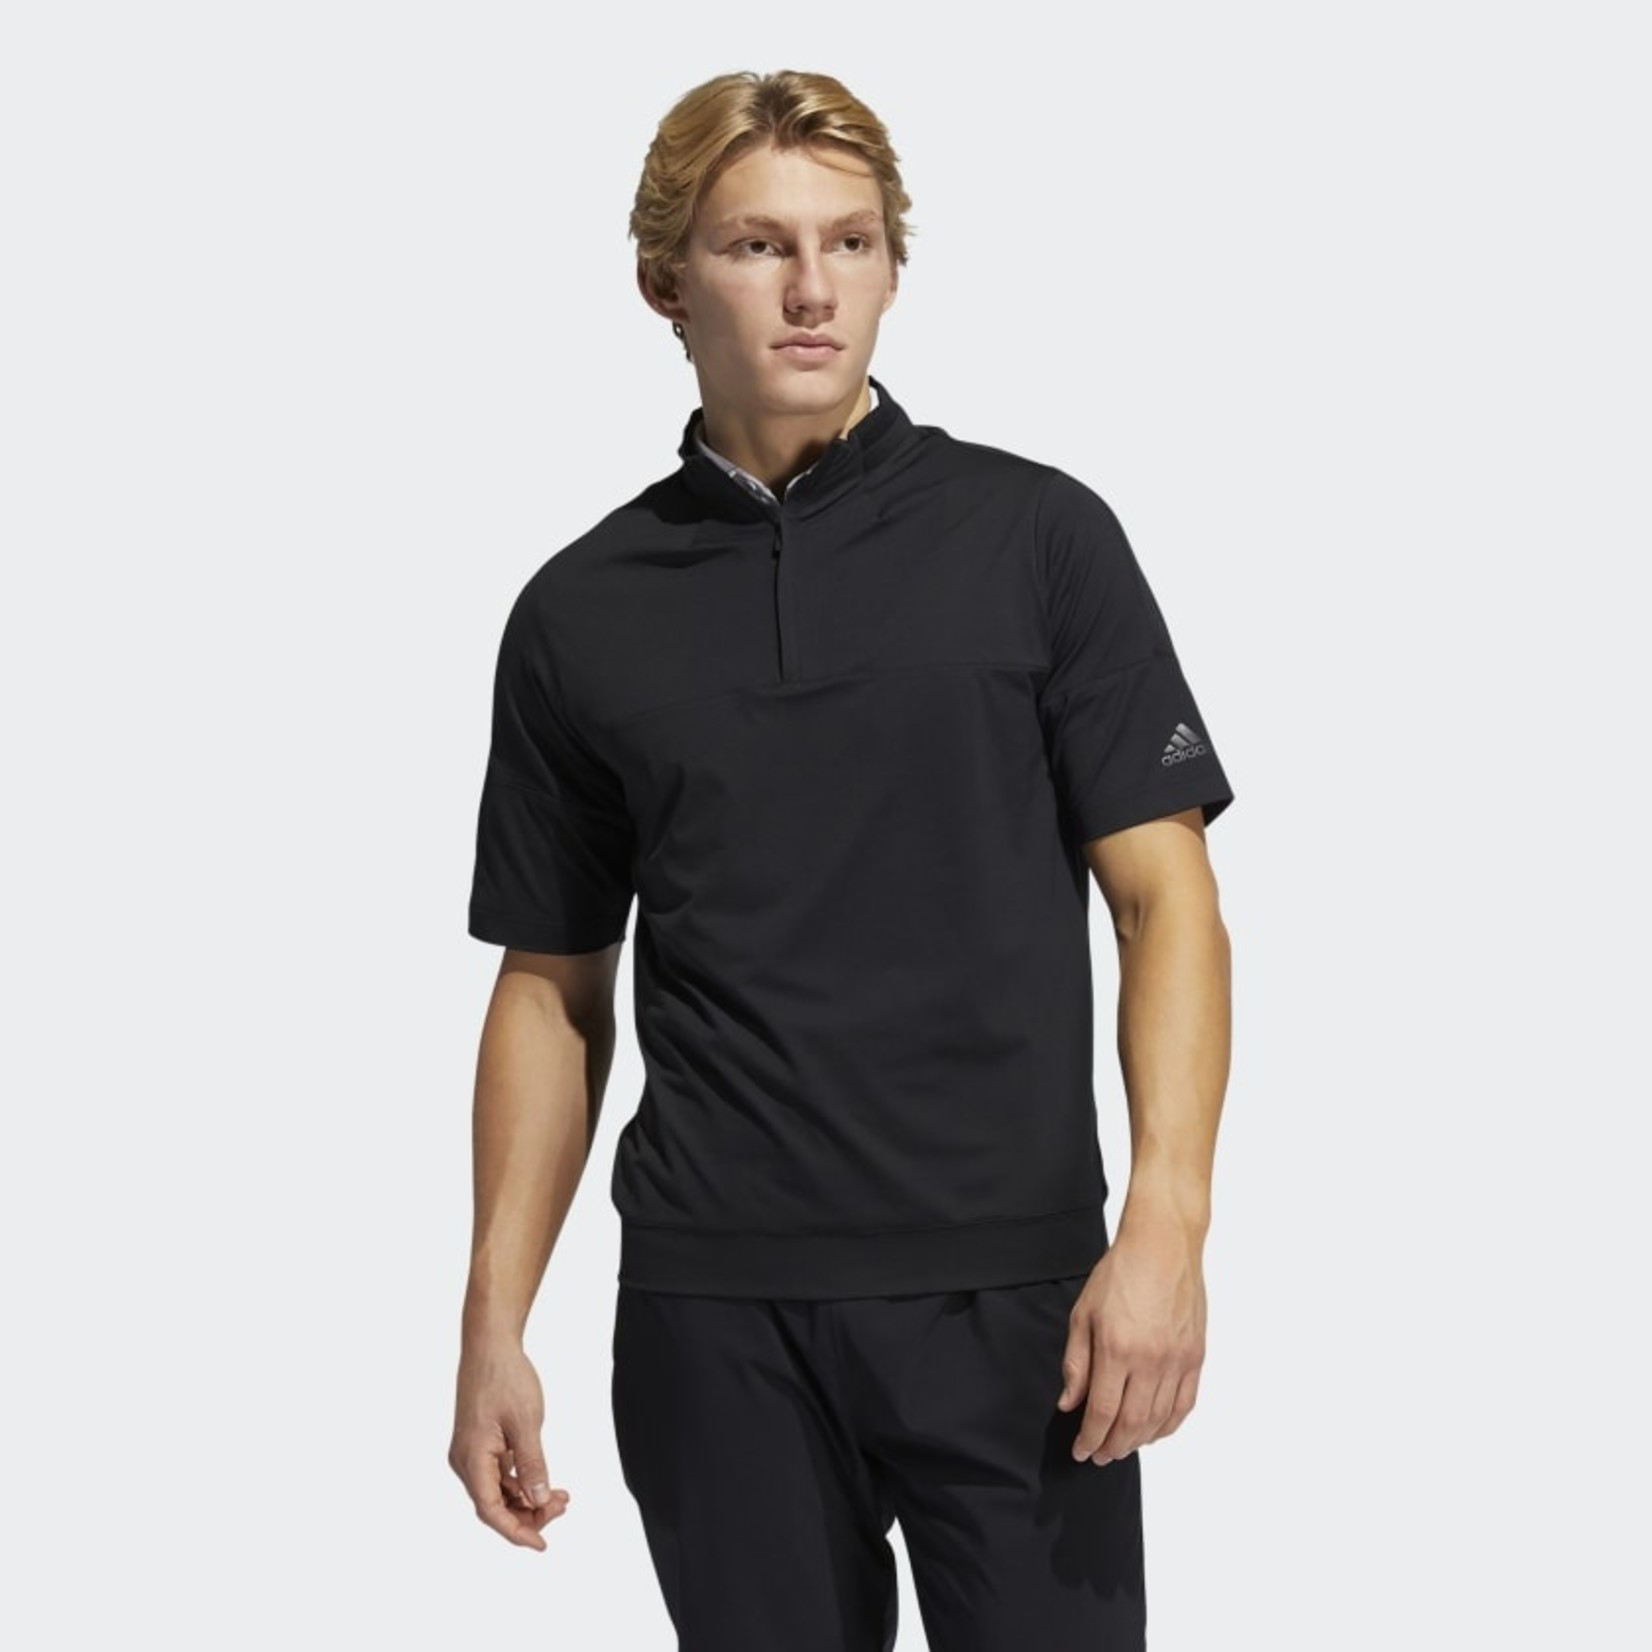 Adidas Adidas Men's Short Sleeve Wind Jacket-21